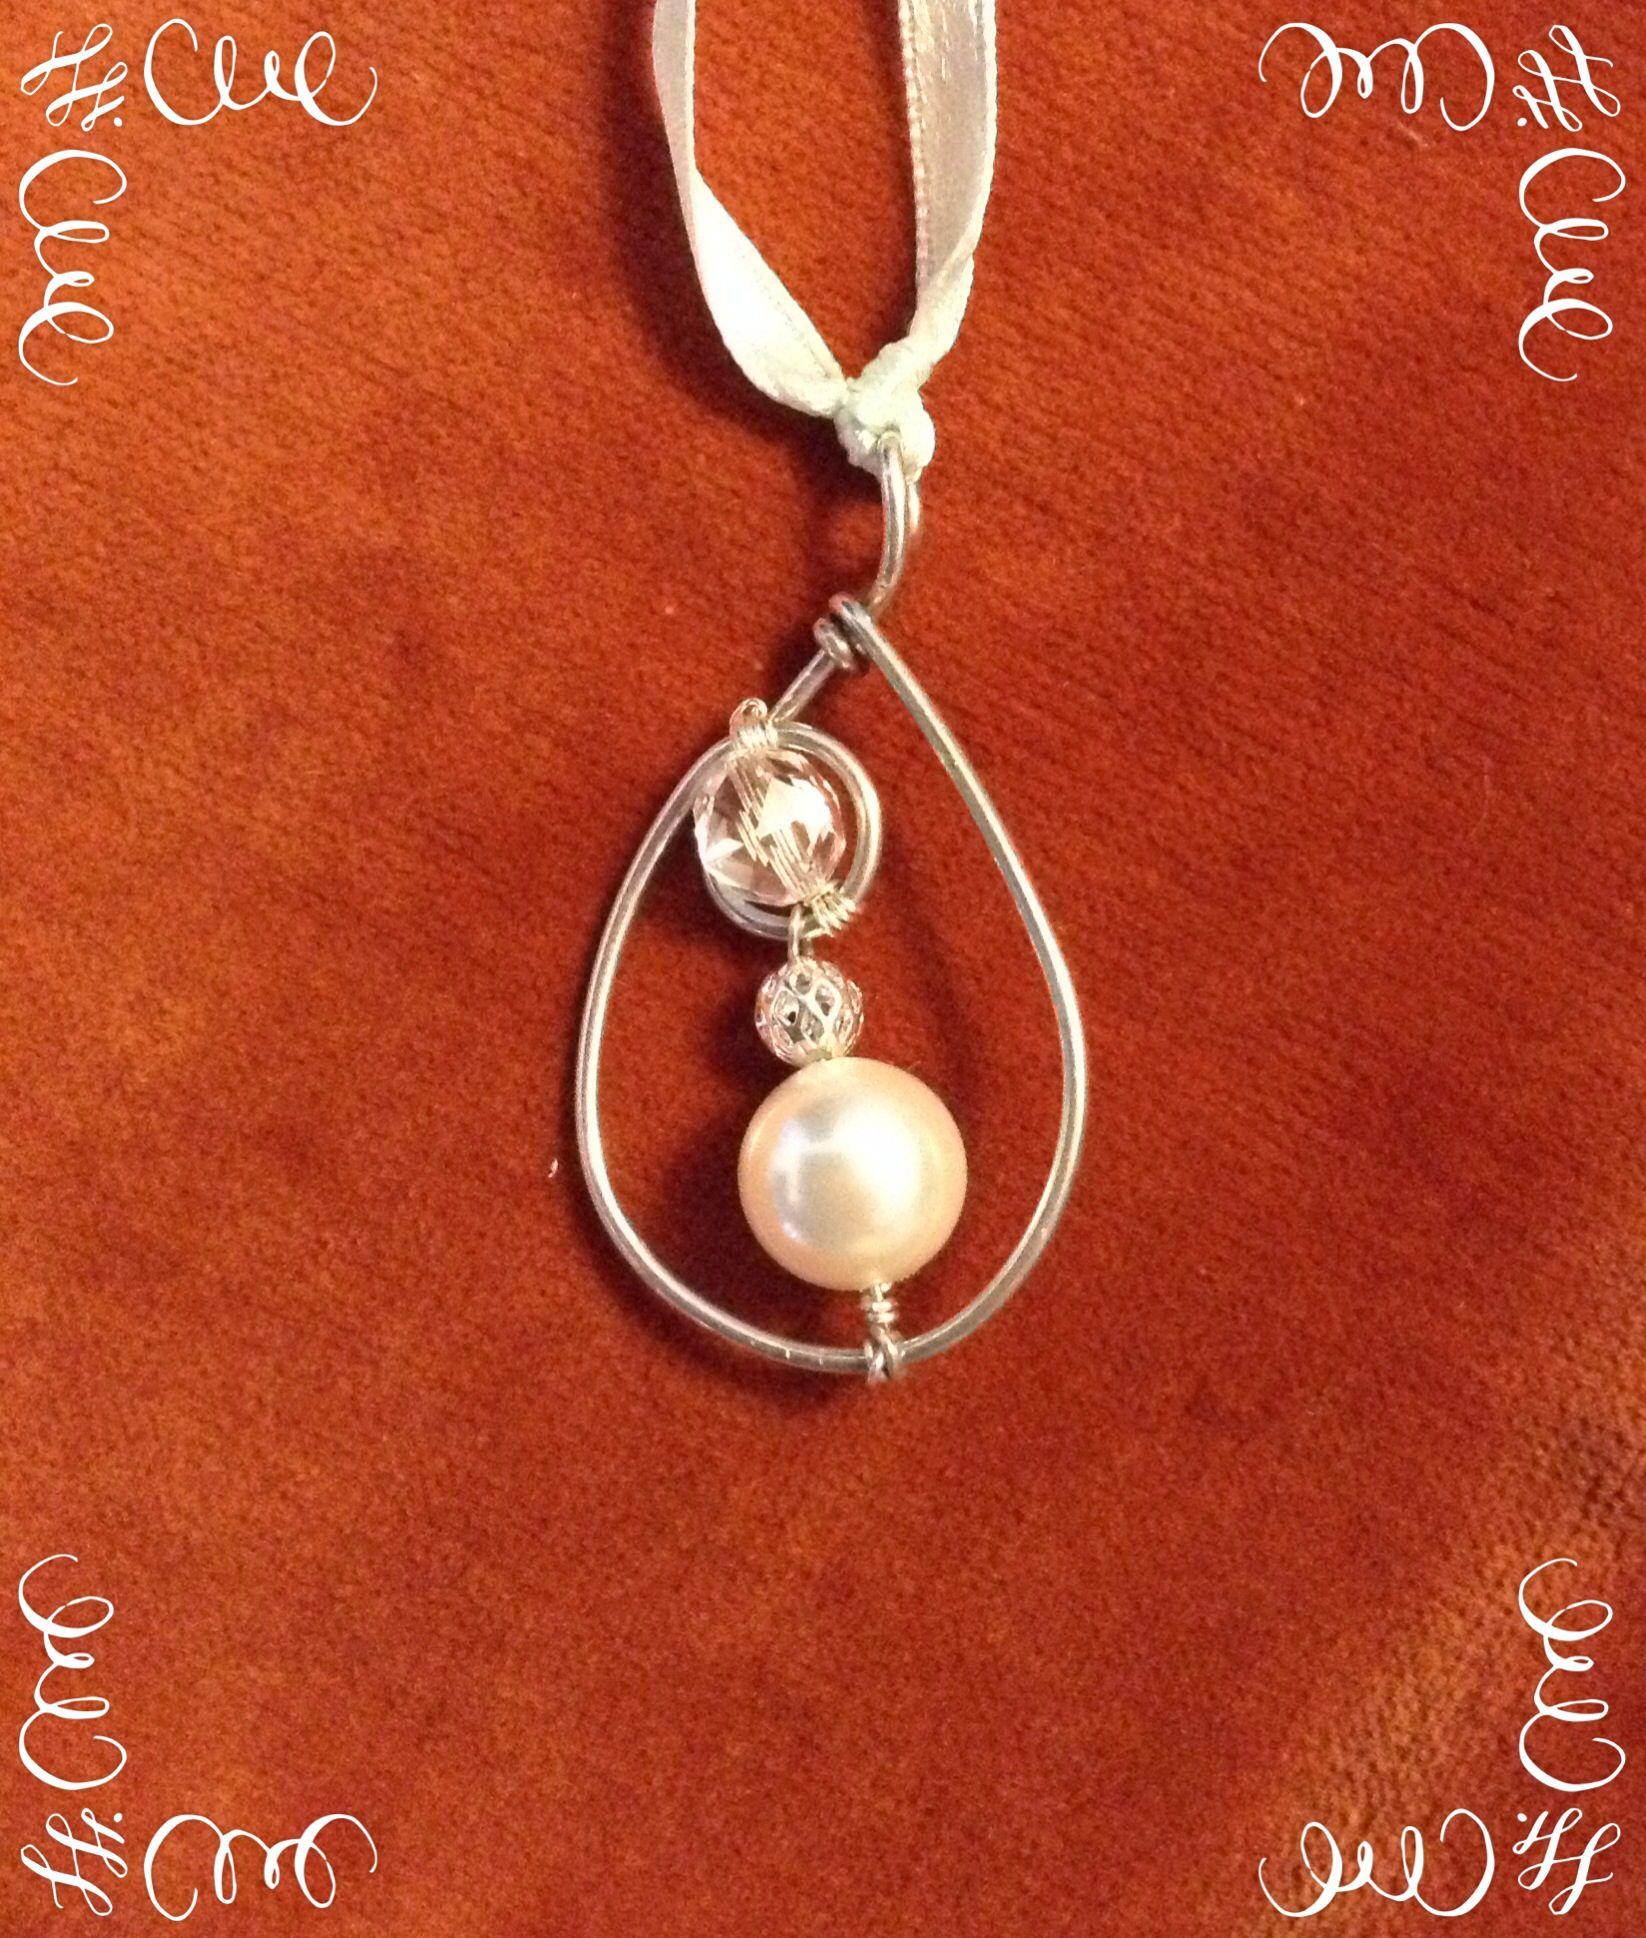 Handmade, 925 Sterling Silver wire with Swarovski bead and Quartz bead.